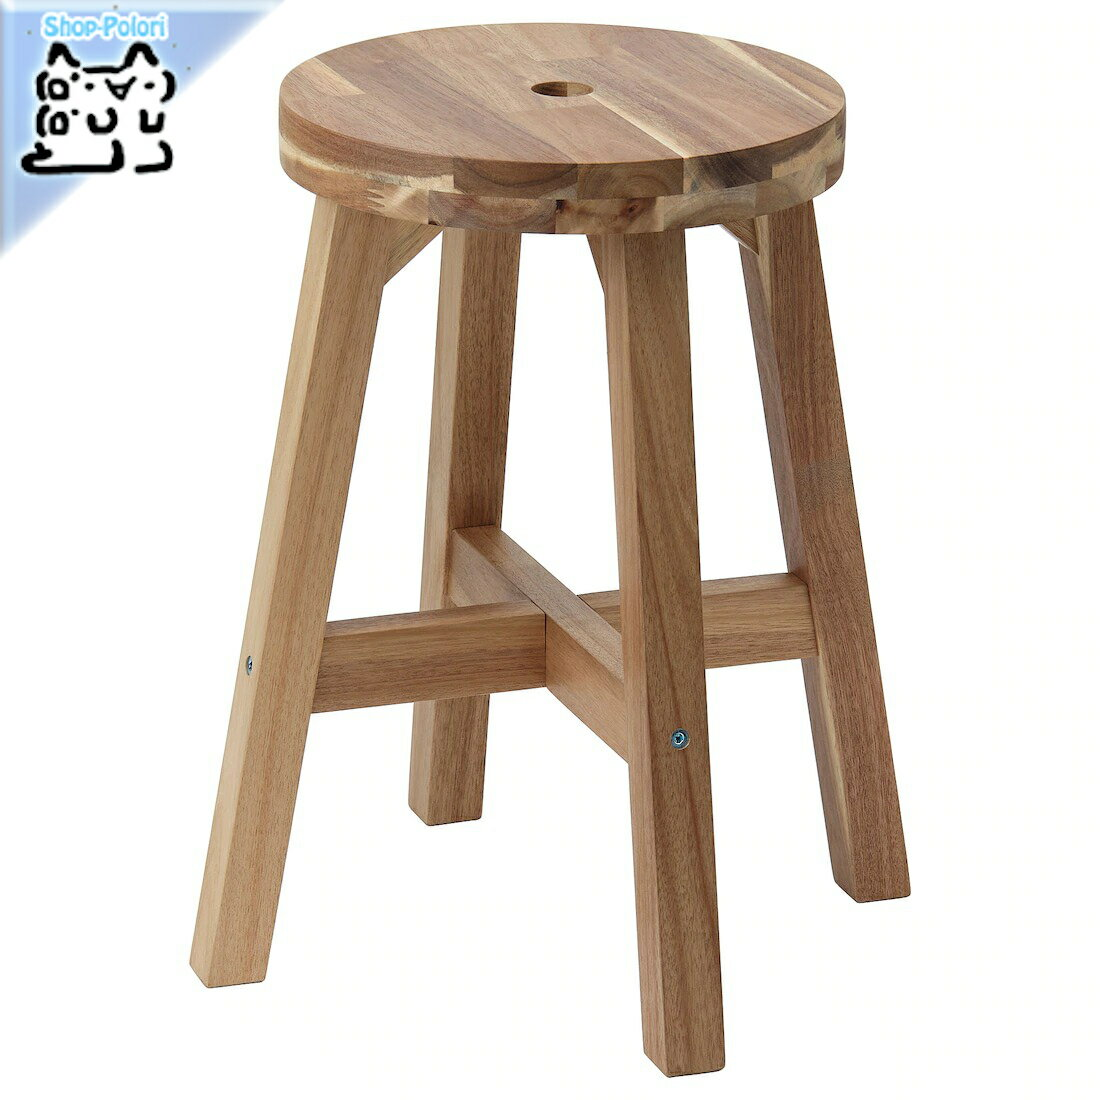 【IKEA Original】SKOGSTA -スコグスタ- イス スツール アカシア材 45 cm